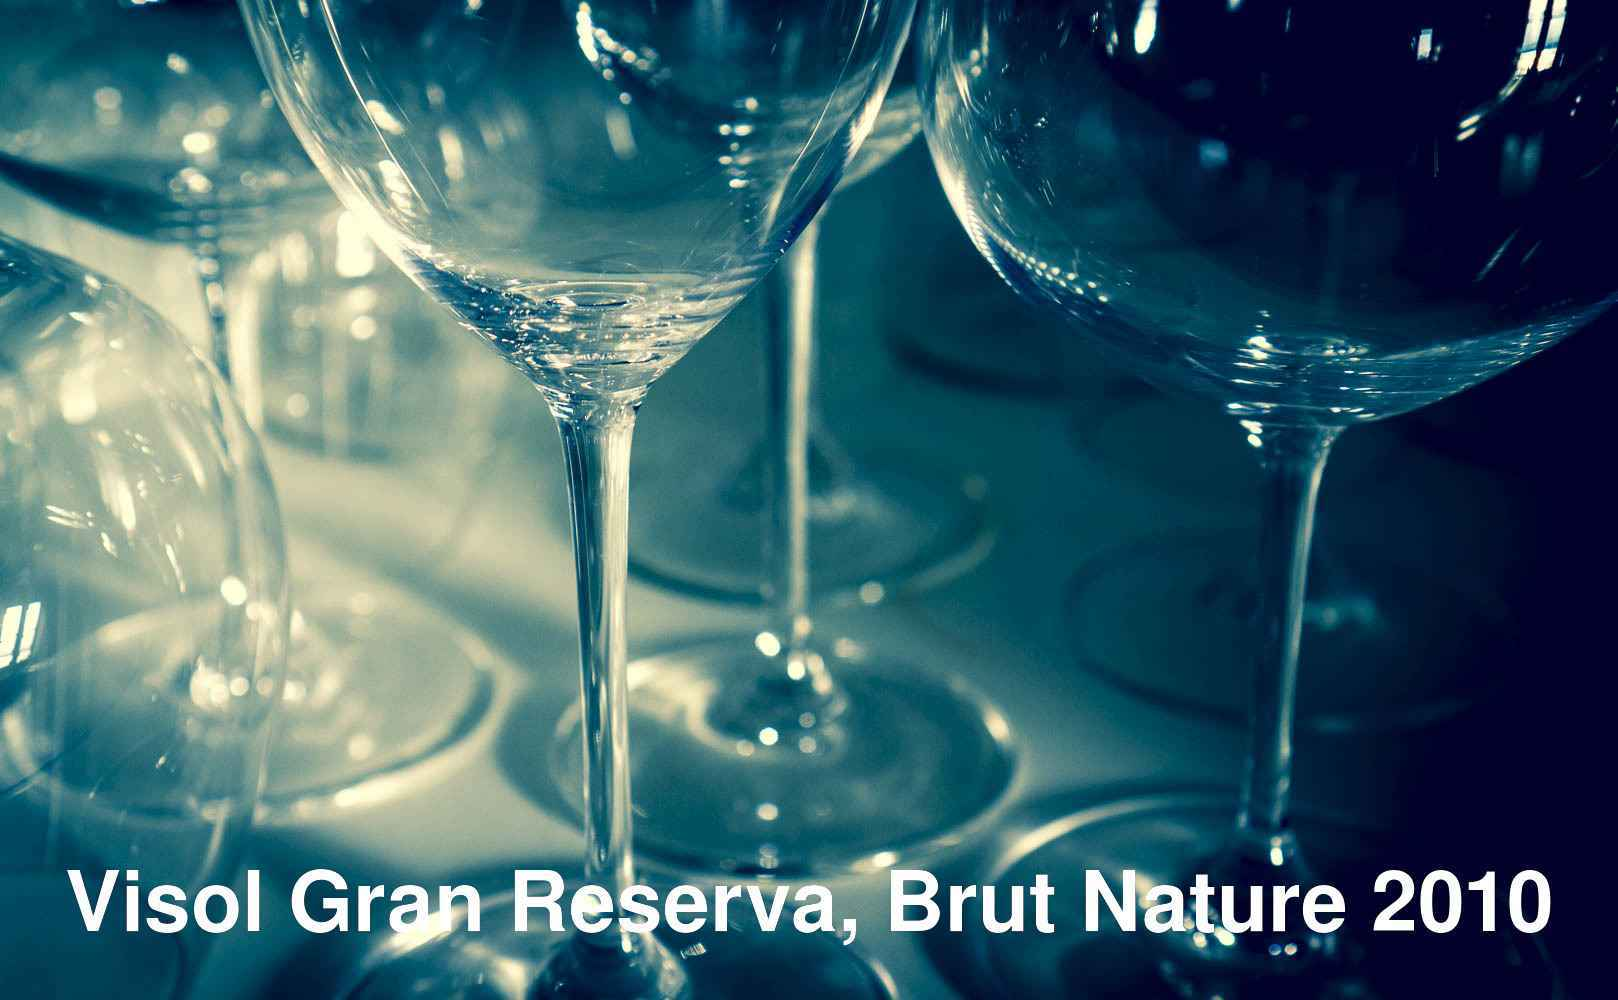 Visol Gran Reserva, Brut Nature 2010 von Mestres aus Cava, Spanien